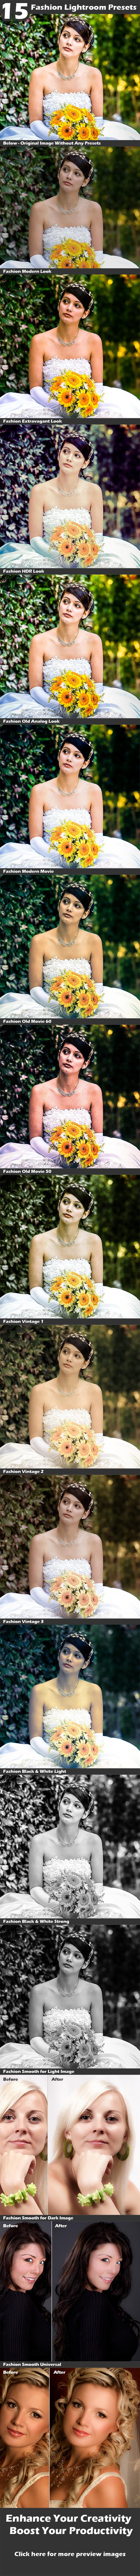 Fashion Presets - Portrait Lightroom Presets